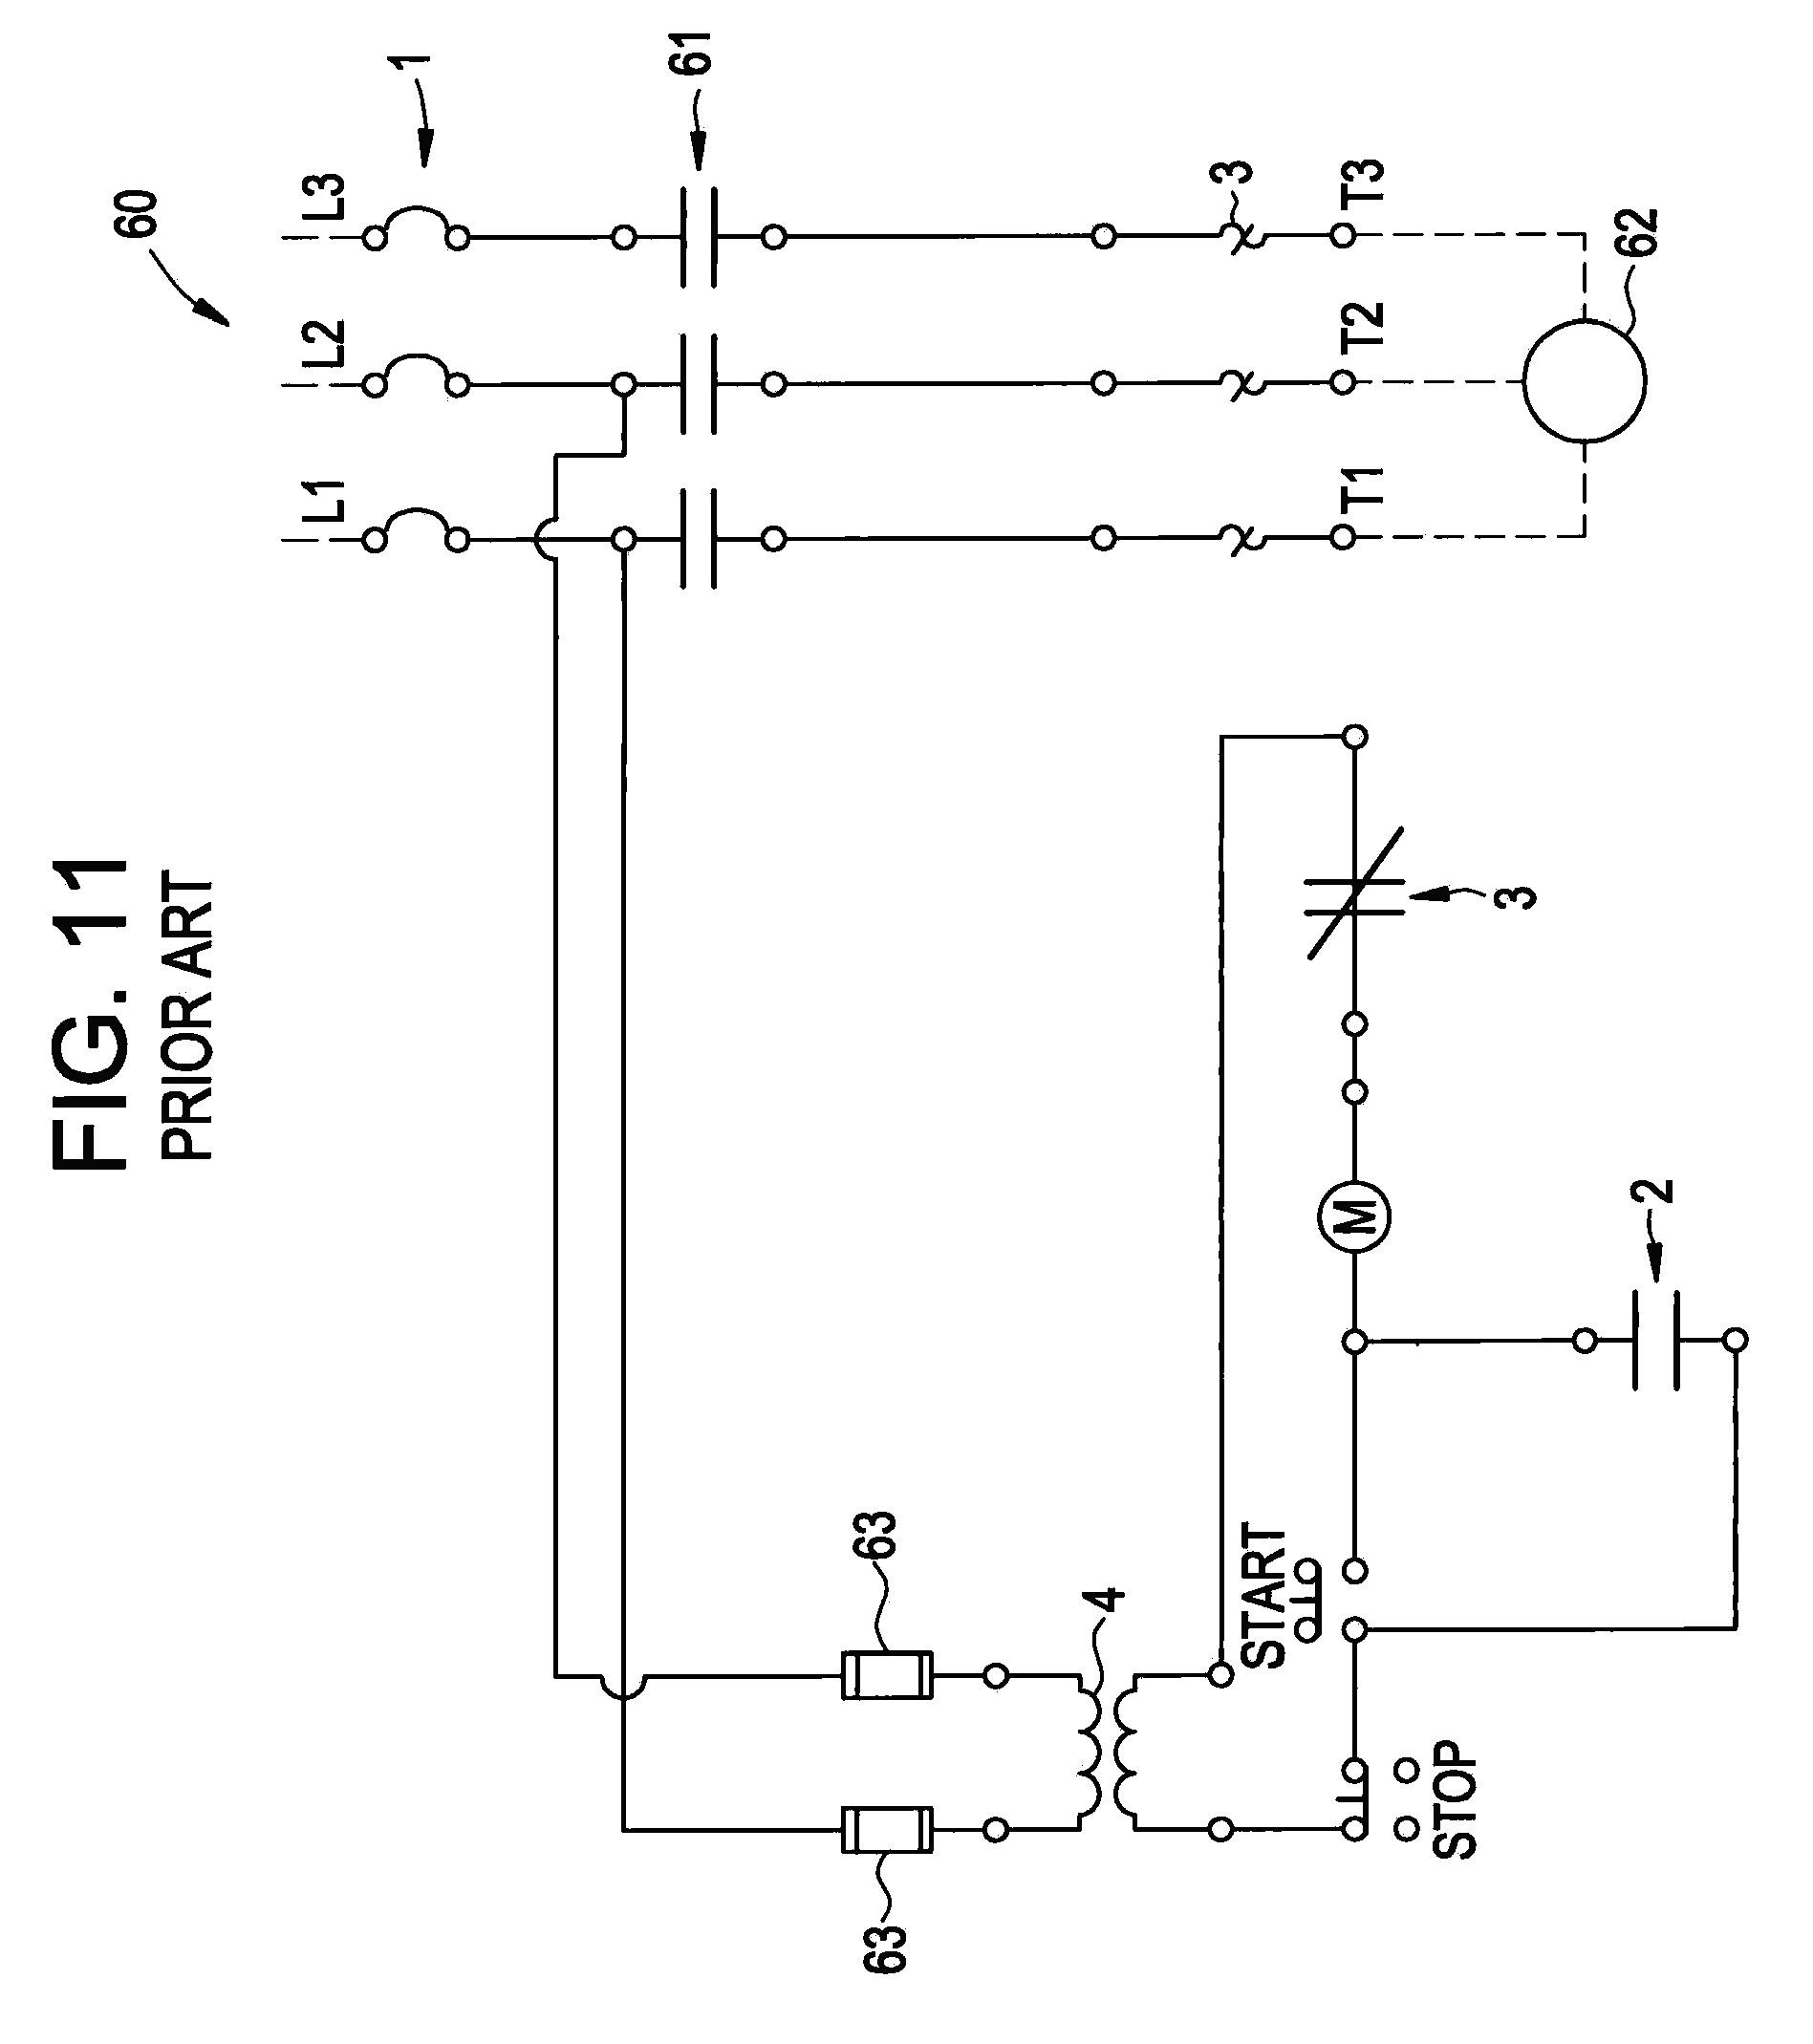 reversible ac motor wiring diagram p38 obd cutler hammer starter pii foneplanet de library rh 48 ggve nl